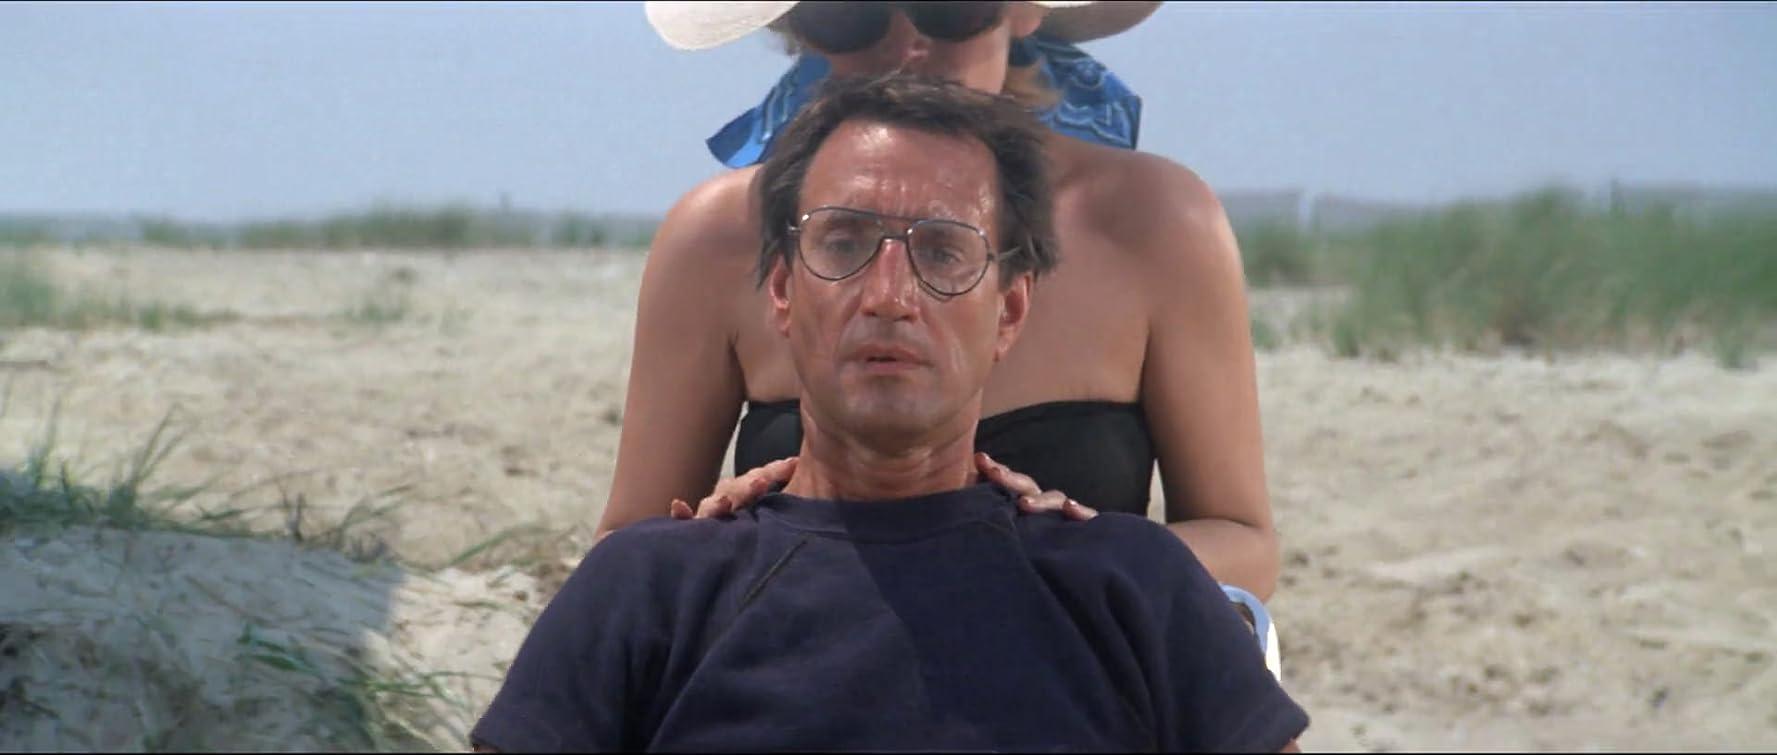 Gilbert Sicotte,Sally Ann Marsh XXX image Frances Lee McCain,Judith Scott (American actress)